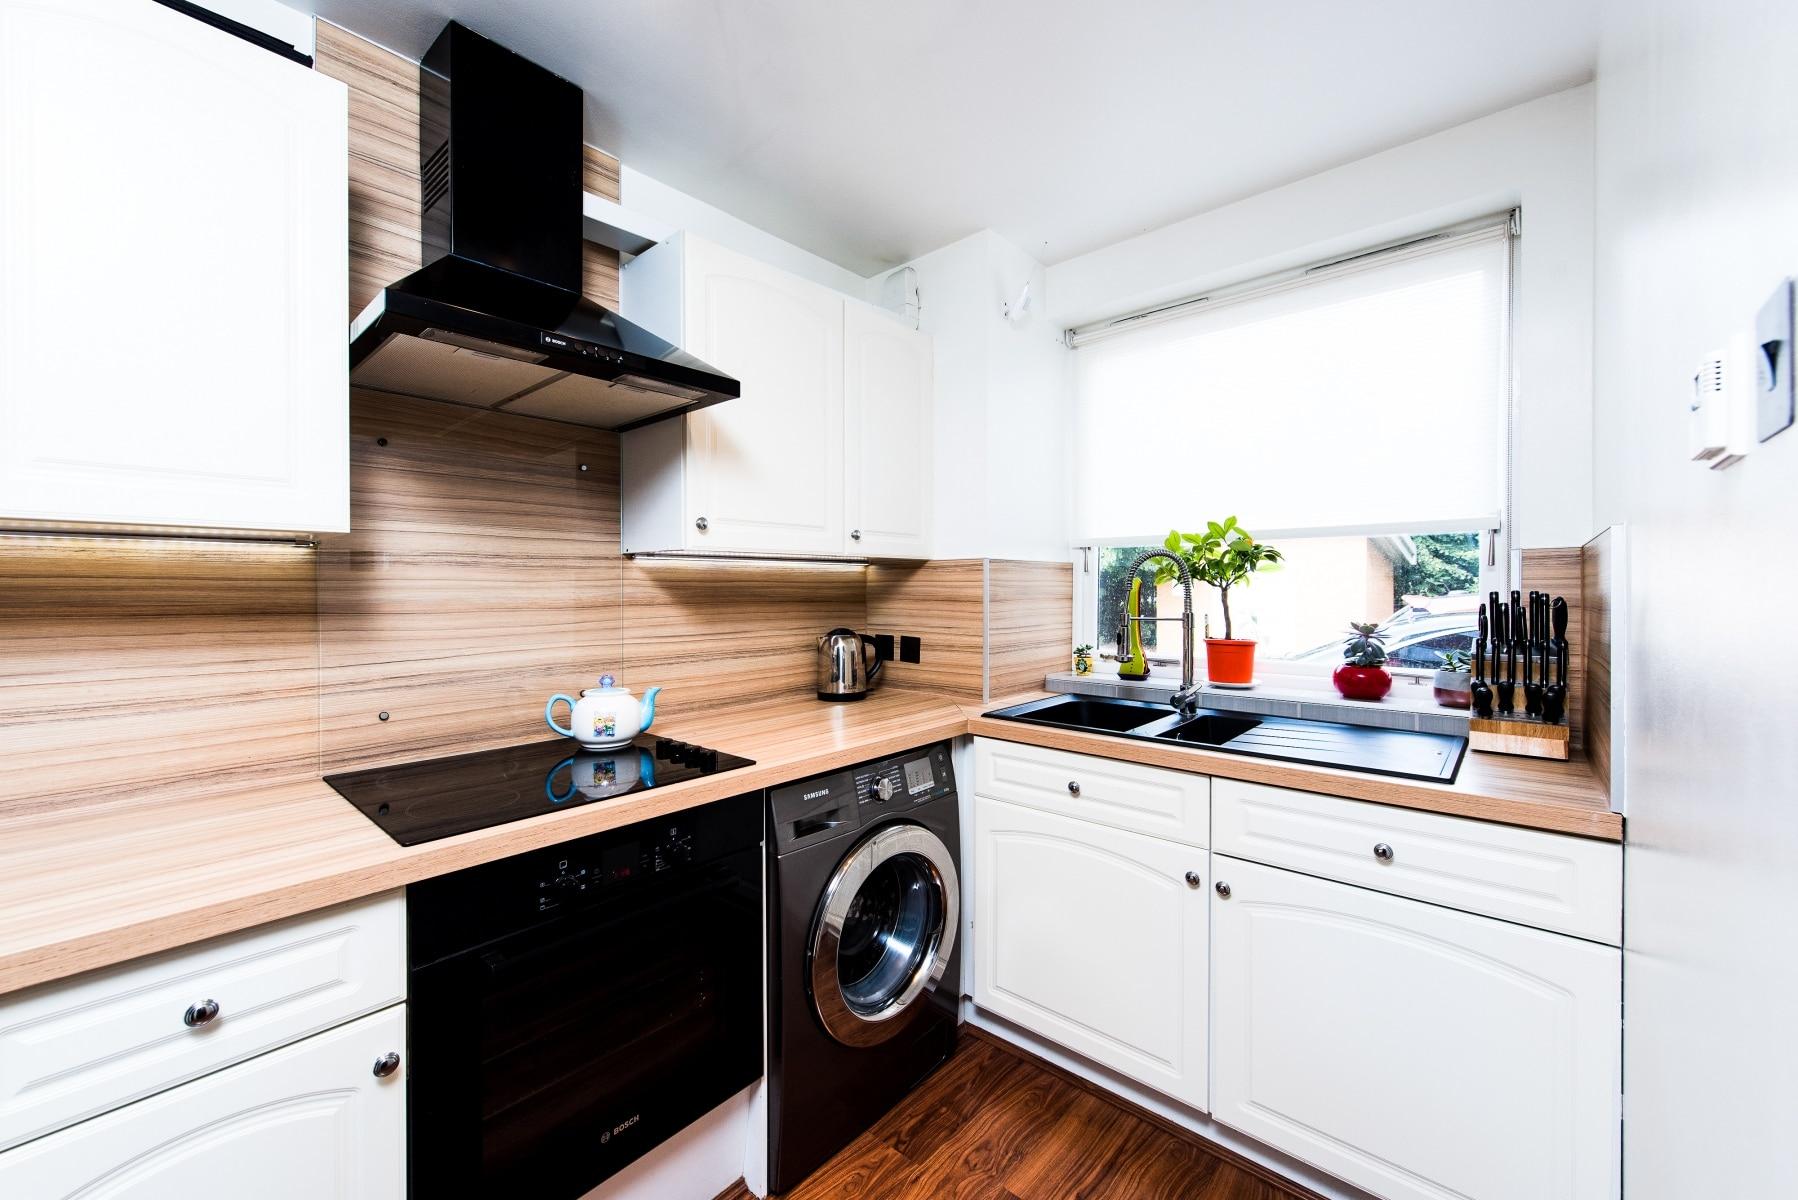 Complete kitchen renovation in Docklands